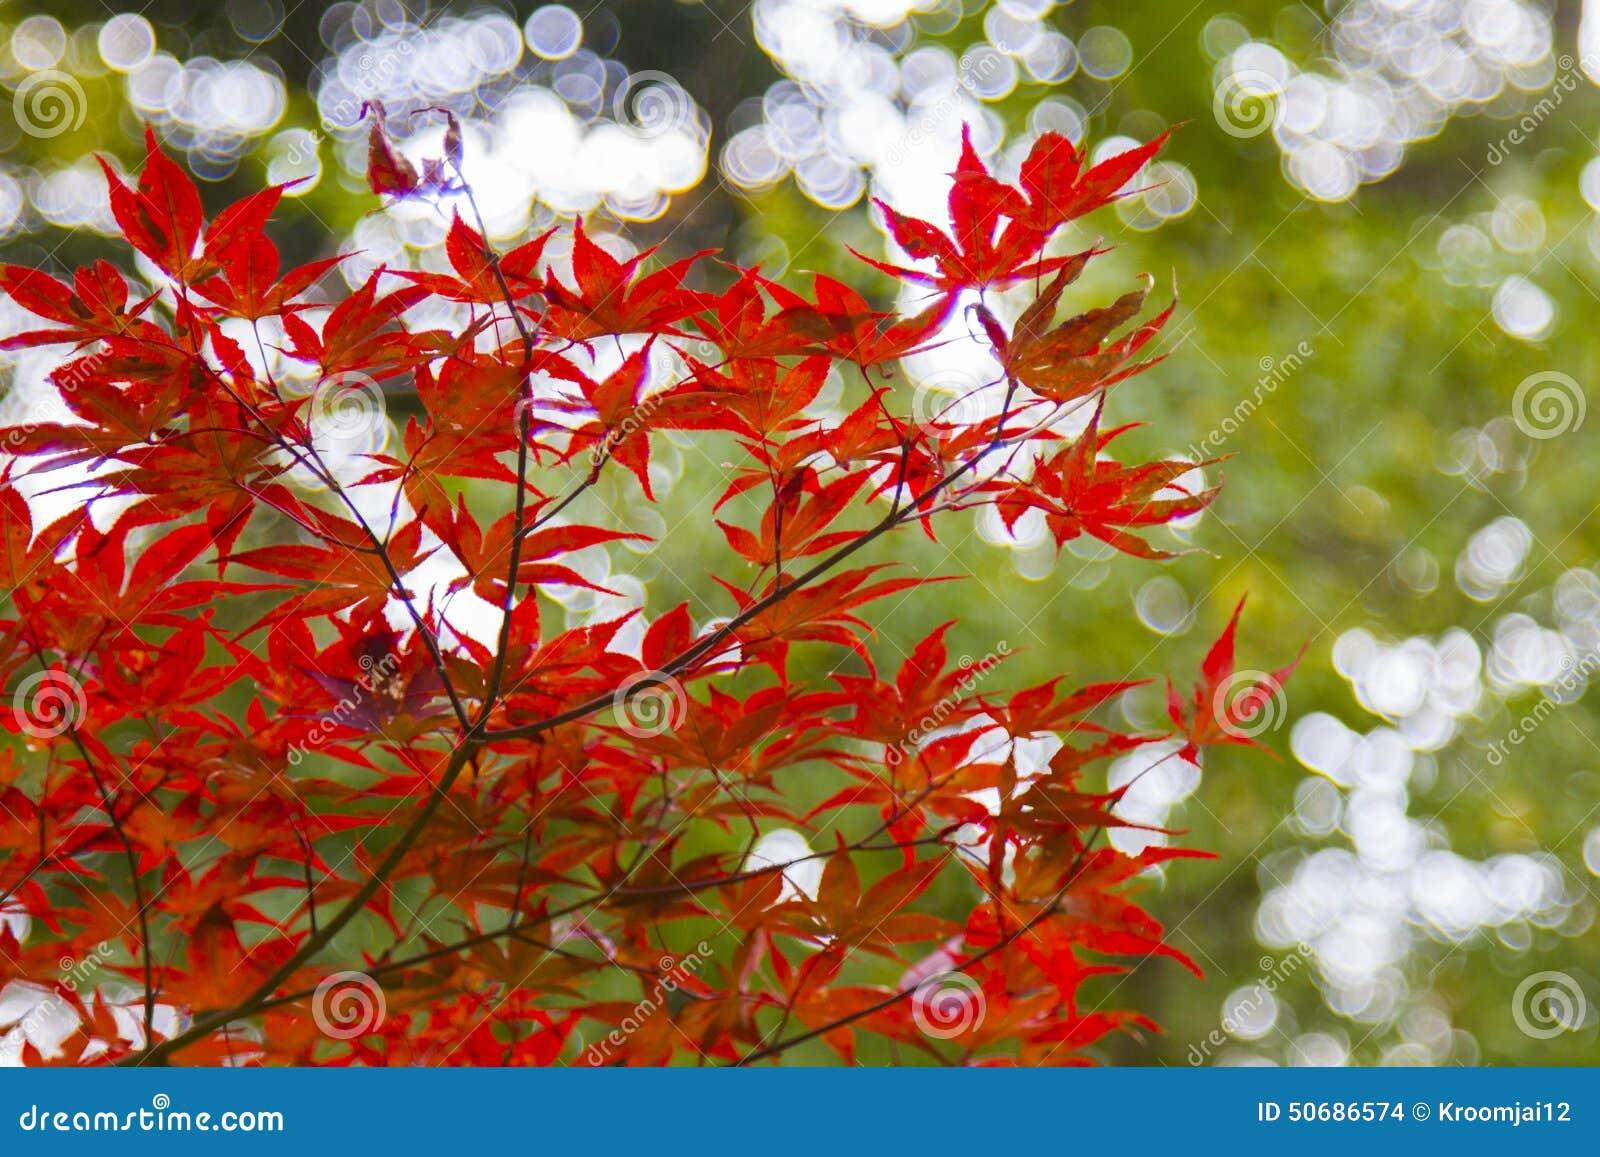 Download 秋叶在日本 库存照片. 图片 包括有 横向, 叶子, 颜色, ,并且, 一些, 绿色, 红色, 关闭, 东京 - 50686574